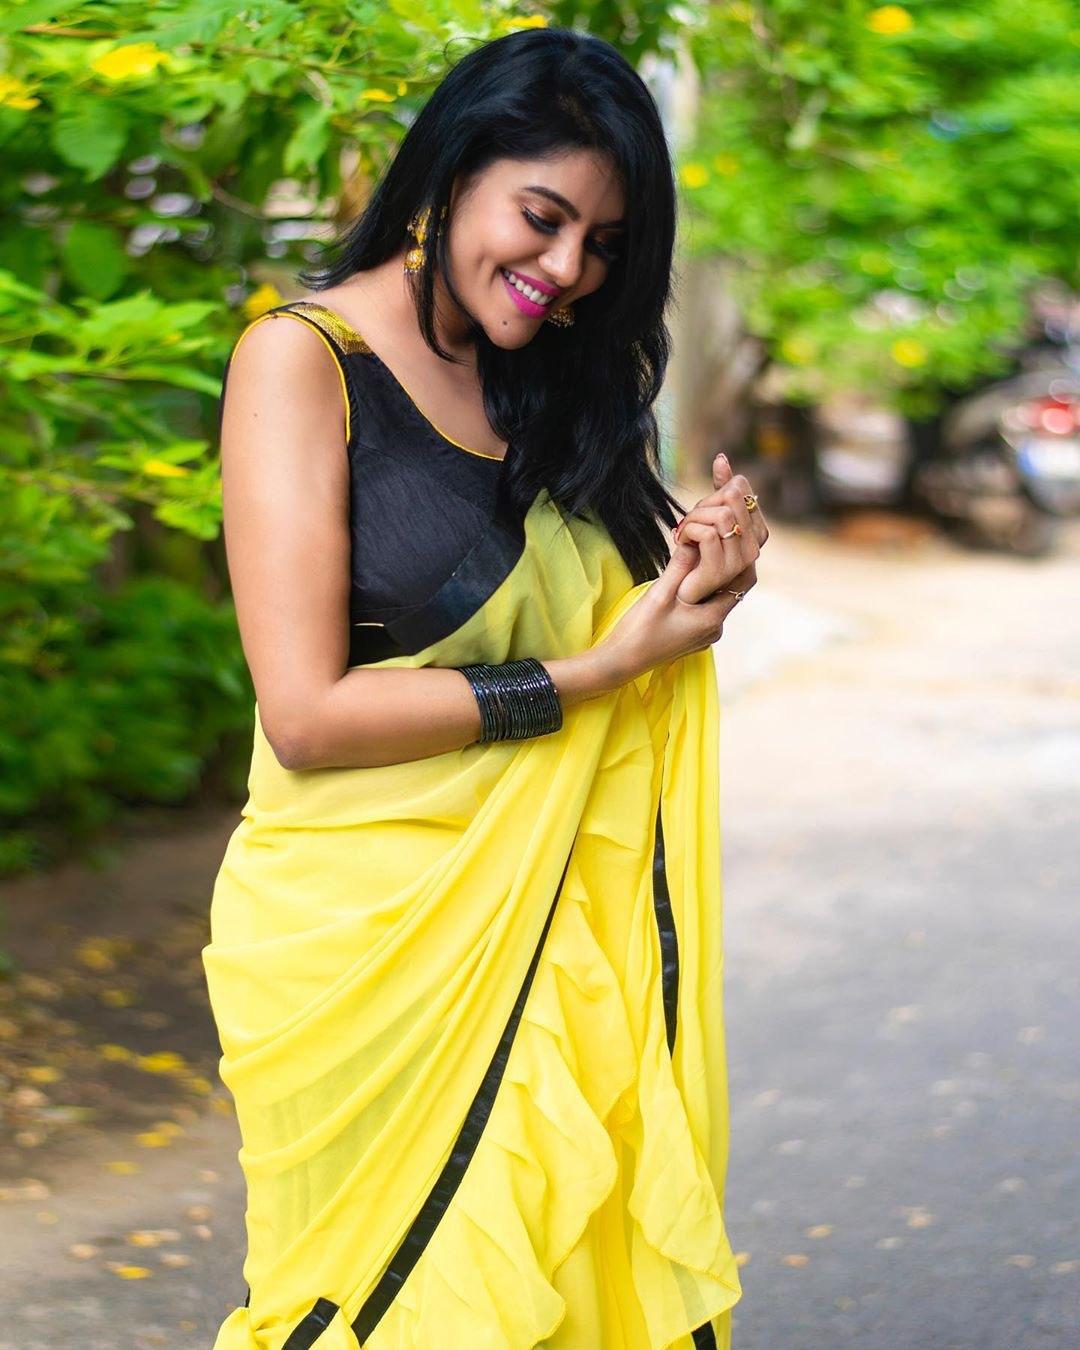 Topless Actress Naked Pic Tamil Pics